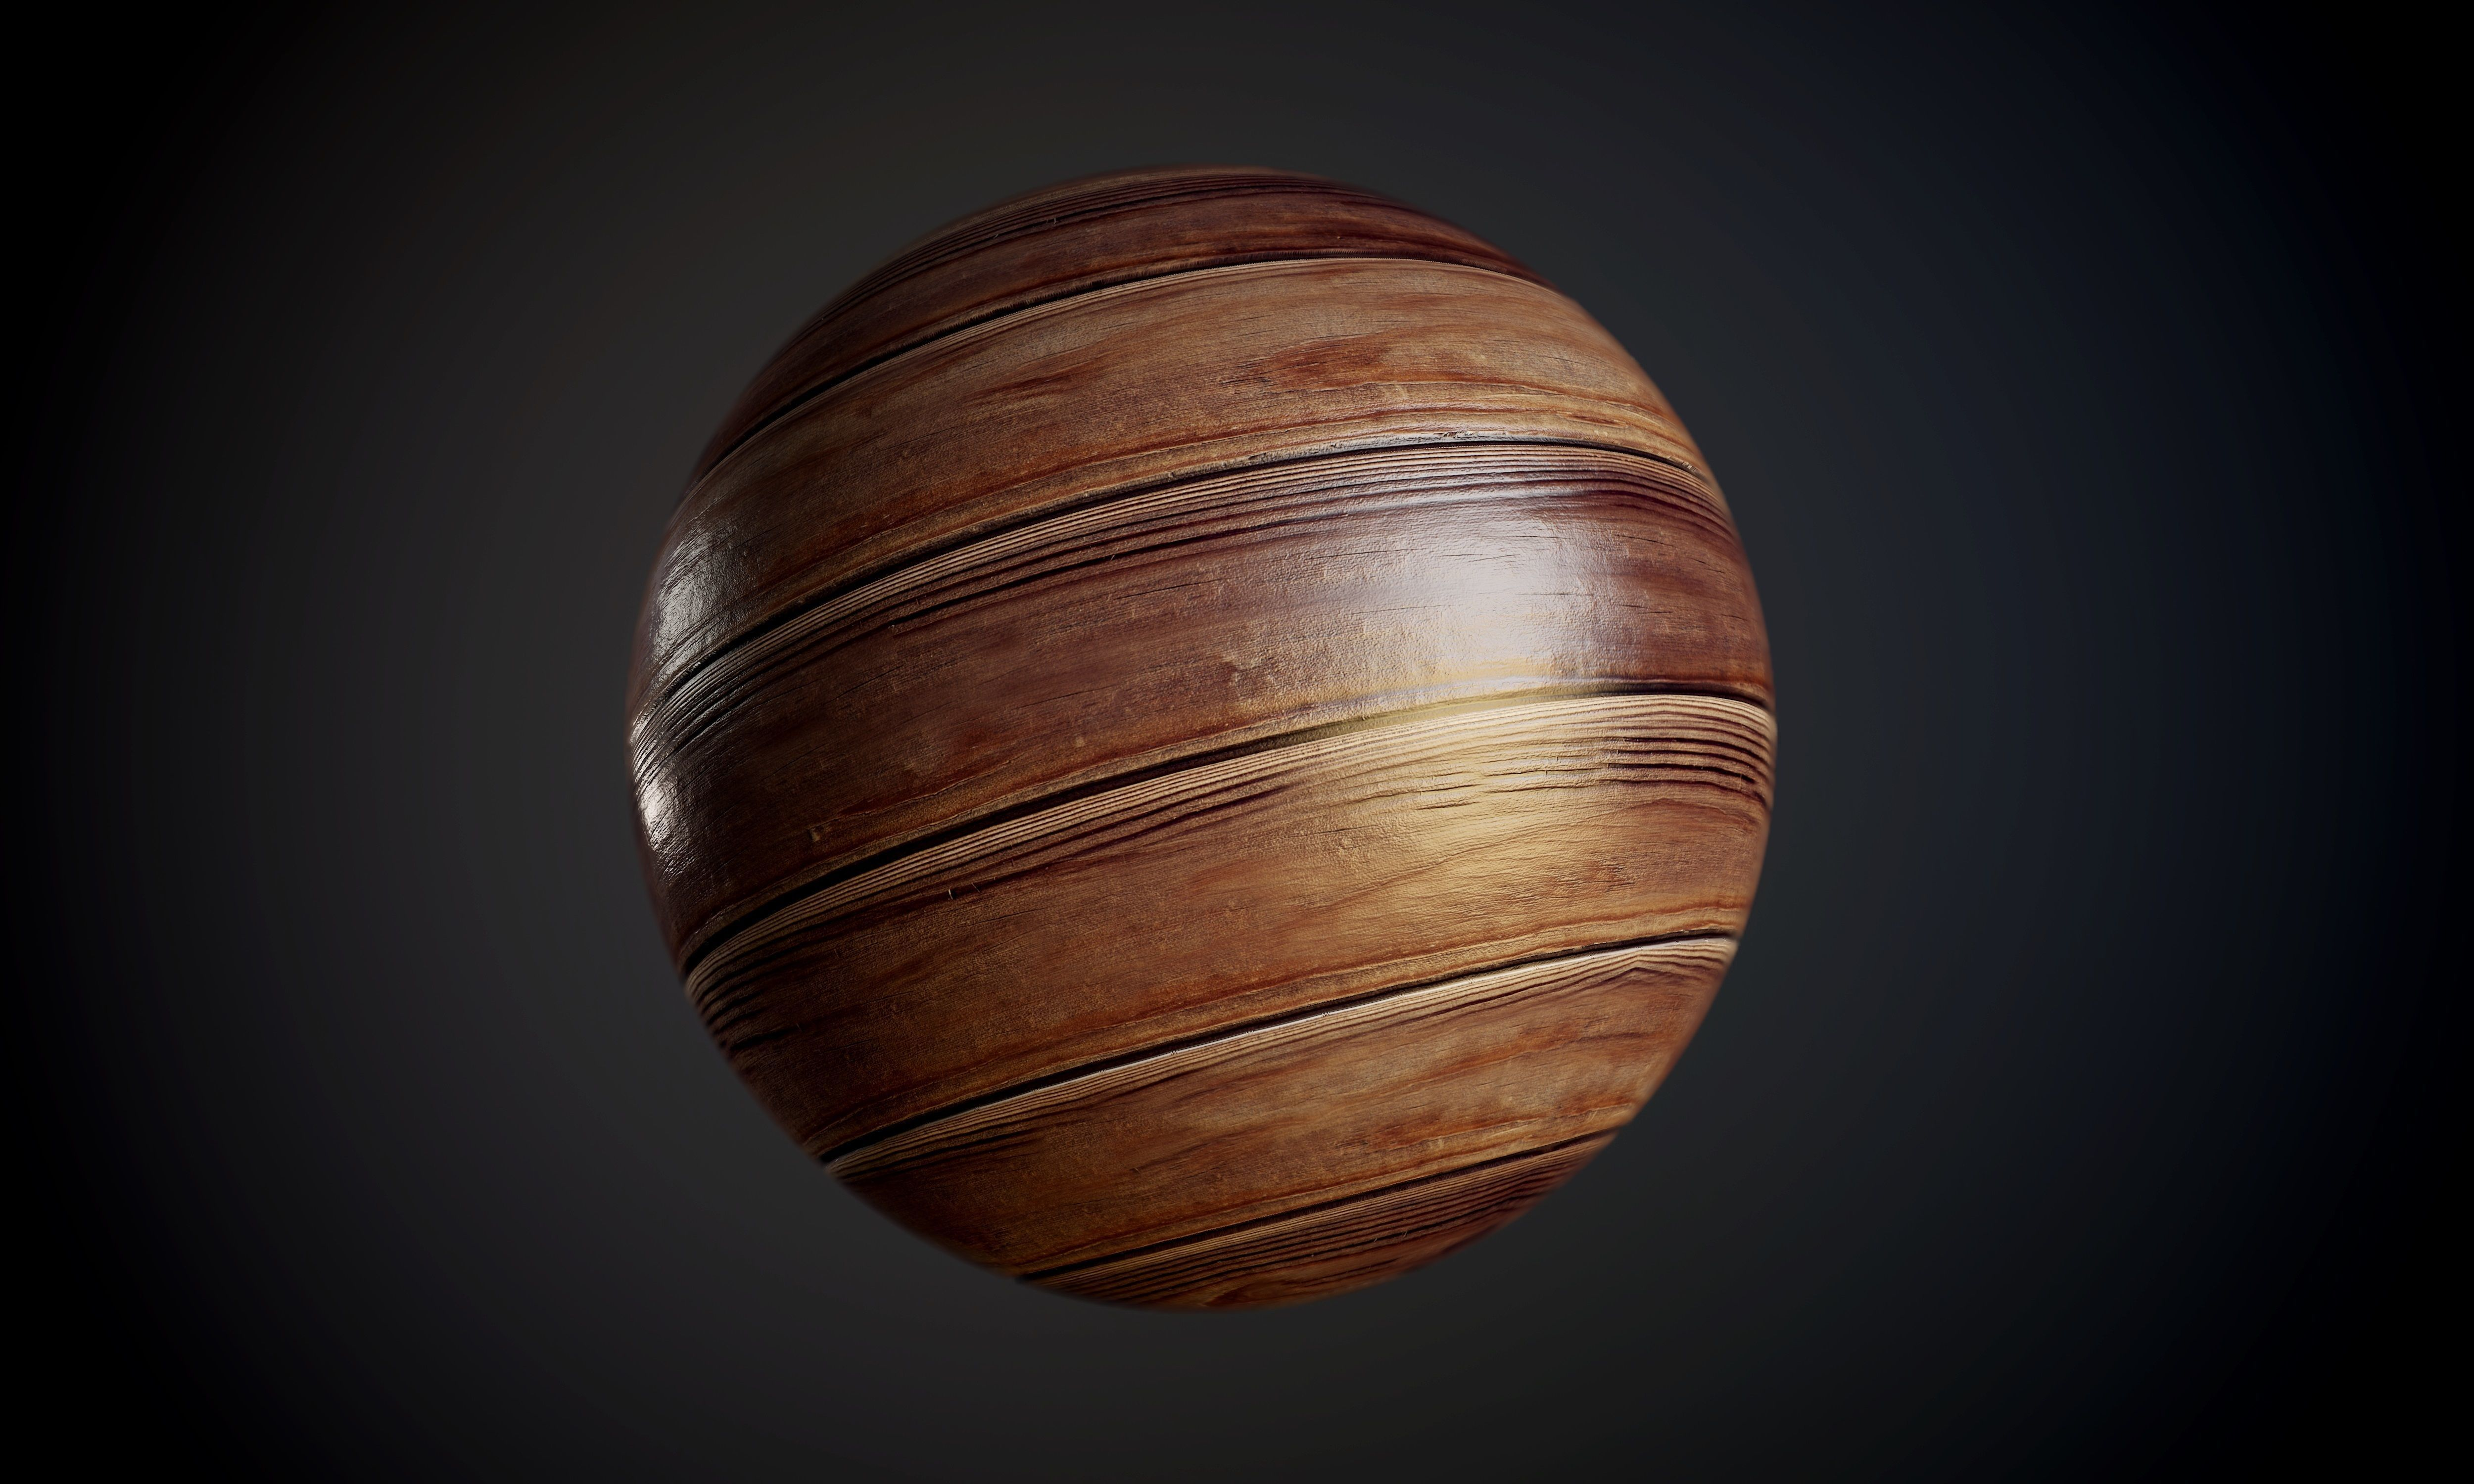 Wood Floor Seamless PBR Texture